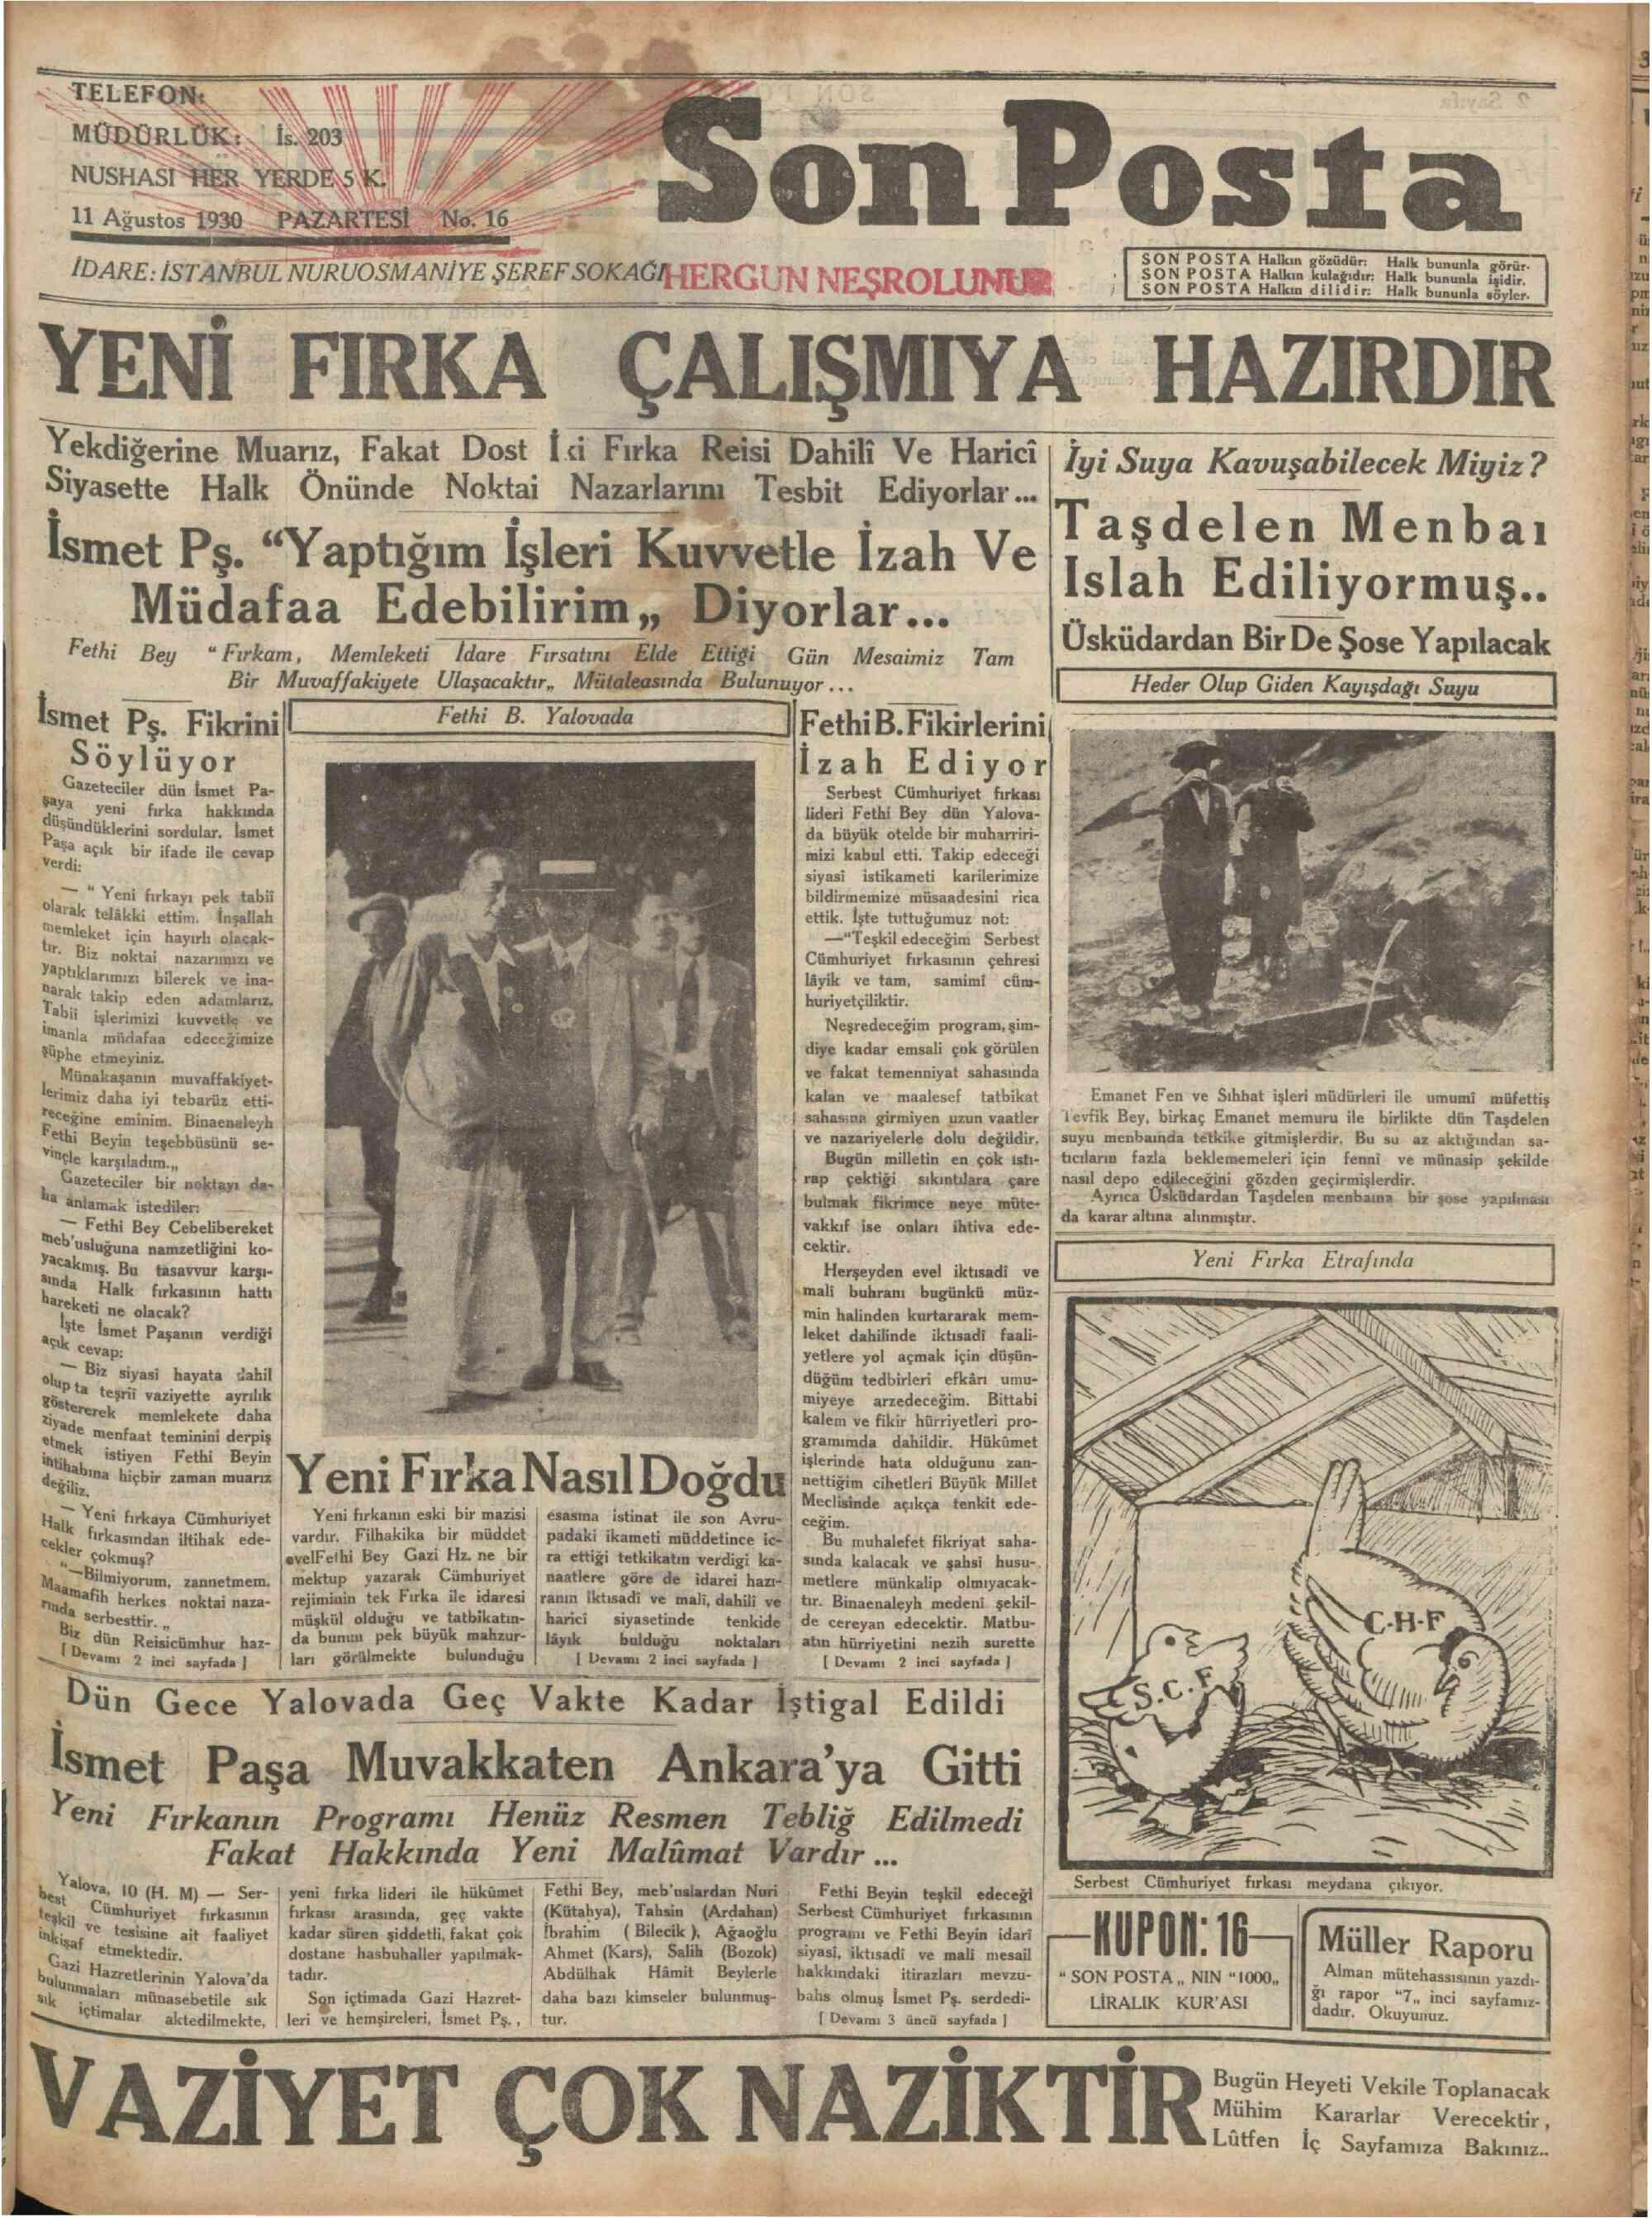 11 Ağustos 1930 Tarihli Son Posta Gazetesi Sayfa 1